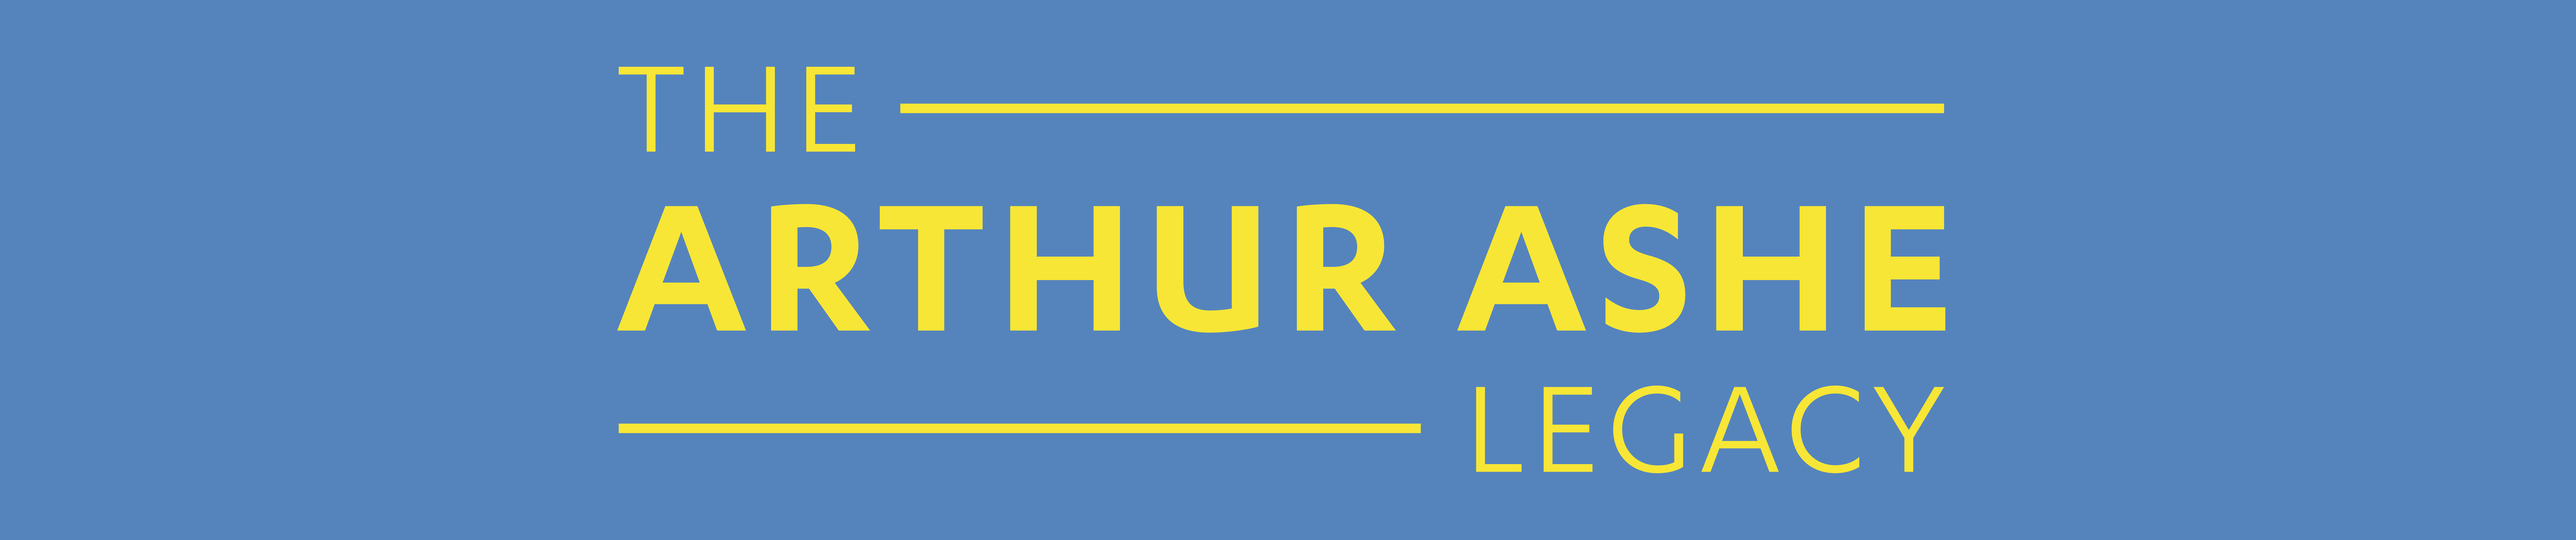 Arthur Ashe Legacy Logo